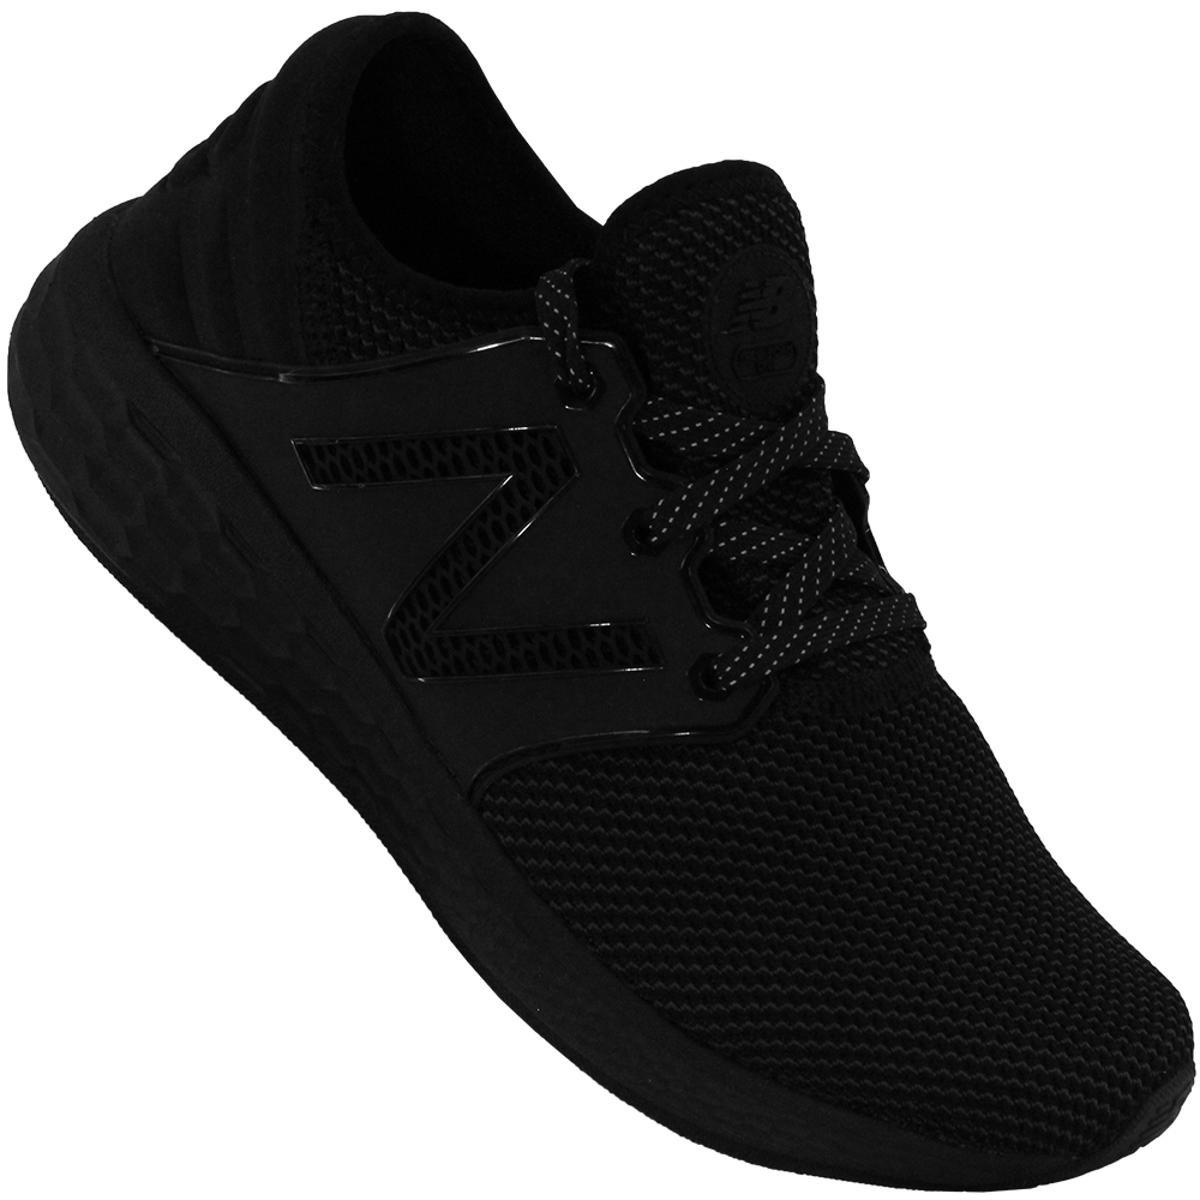 c0b0629d92 Tênis New Balance Foam Cruz V2 Sport Masculino - Compre Agora